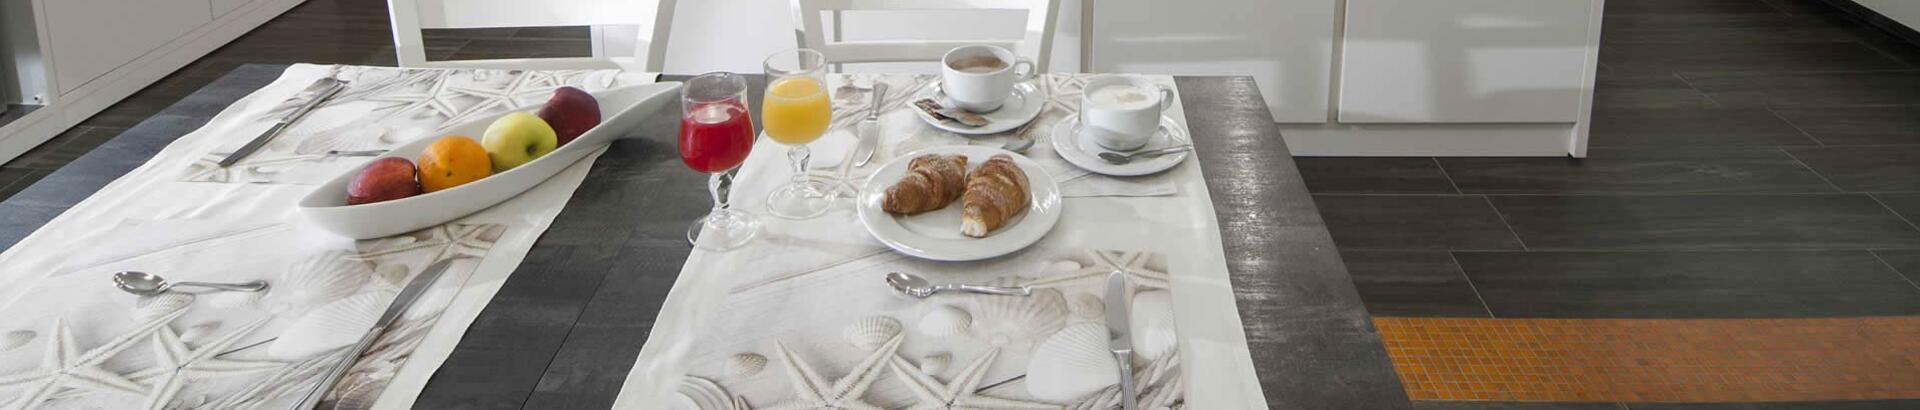 hotelcasablanca en breakfast 004